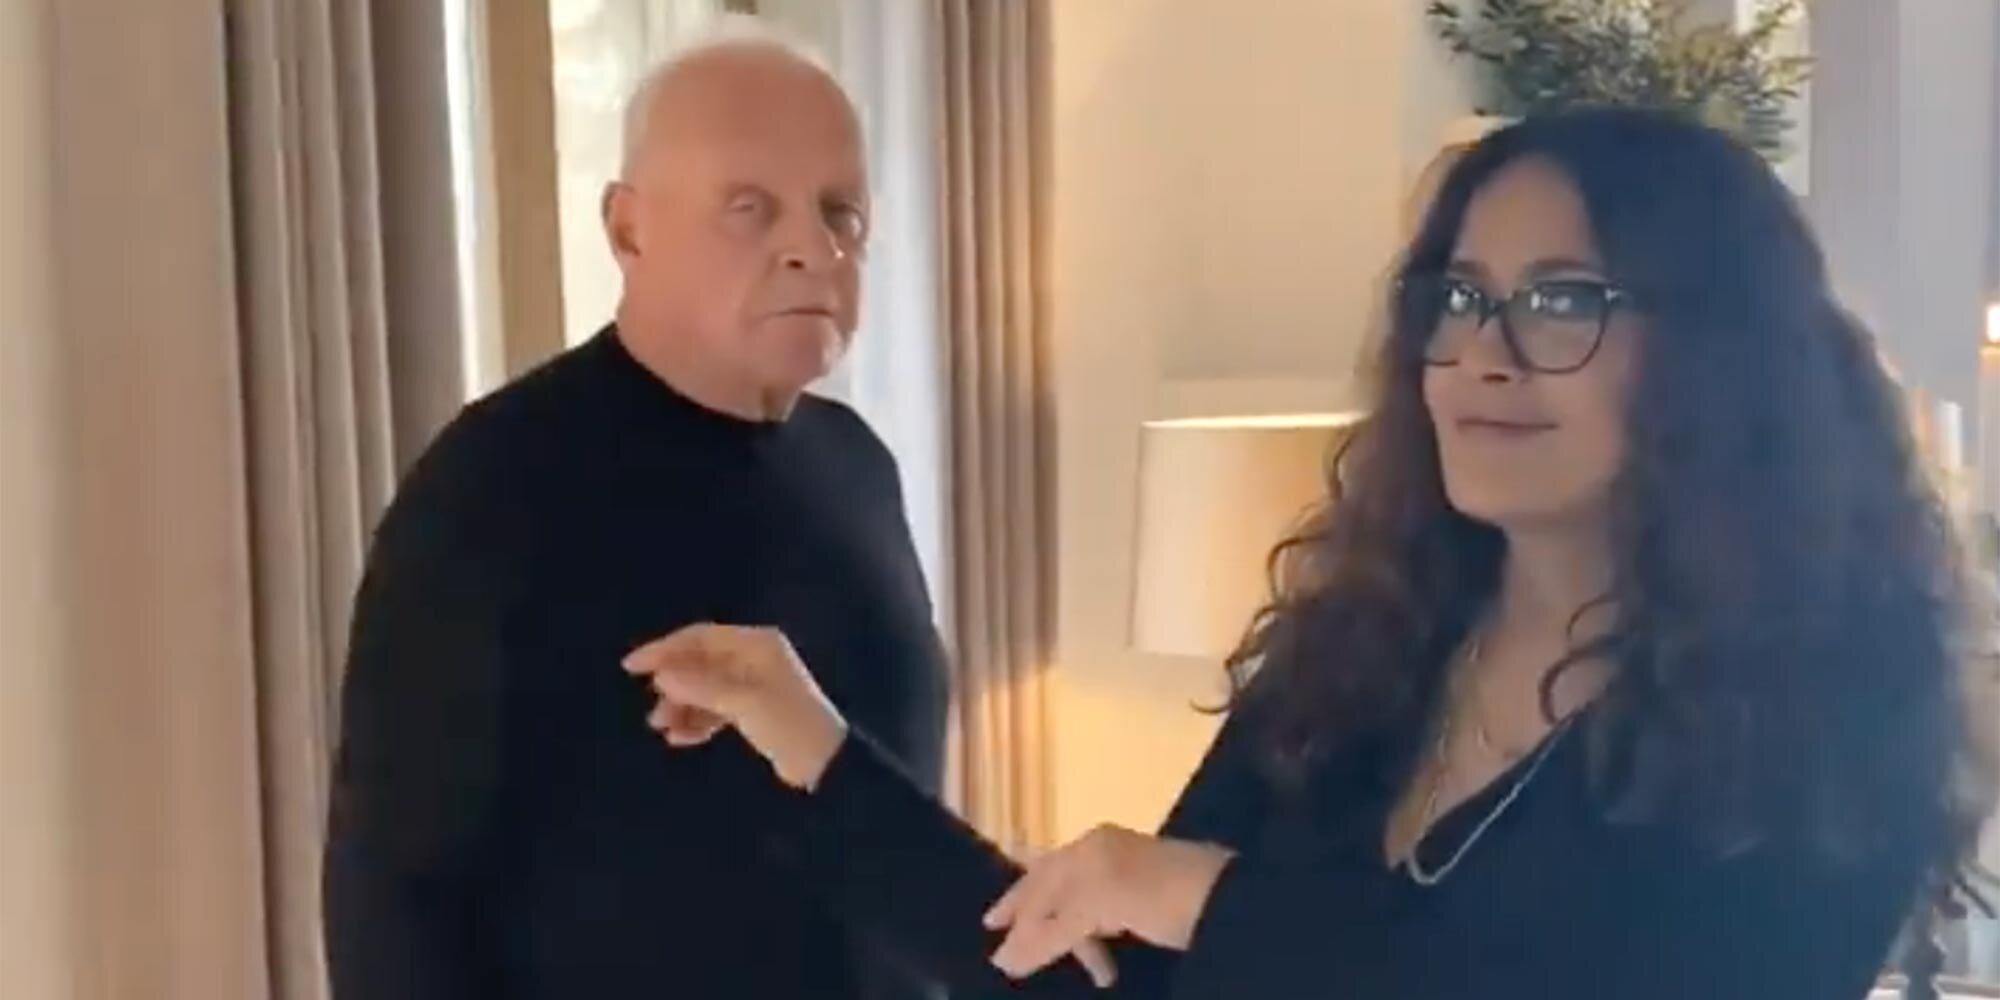 Salma Hayek dances with 'the king' Anthony Hopkins in sweet Oscars celebration video